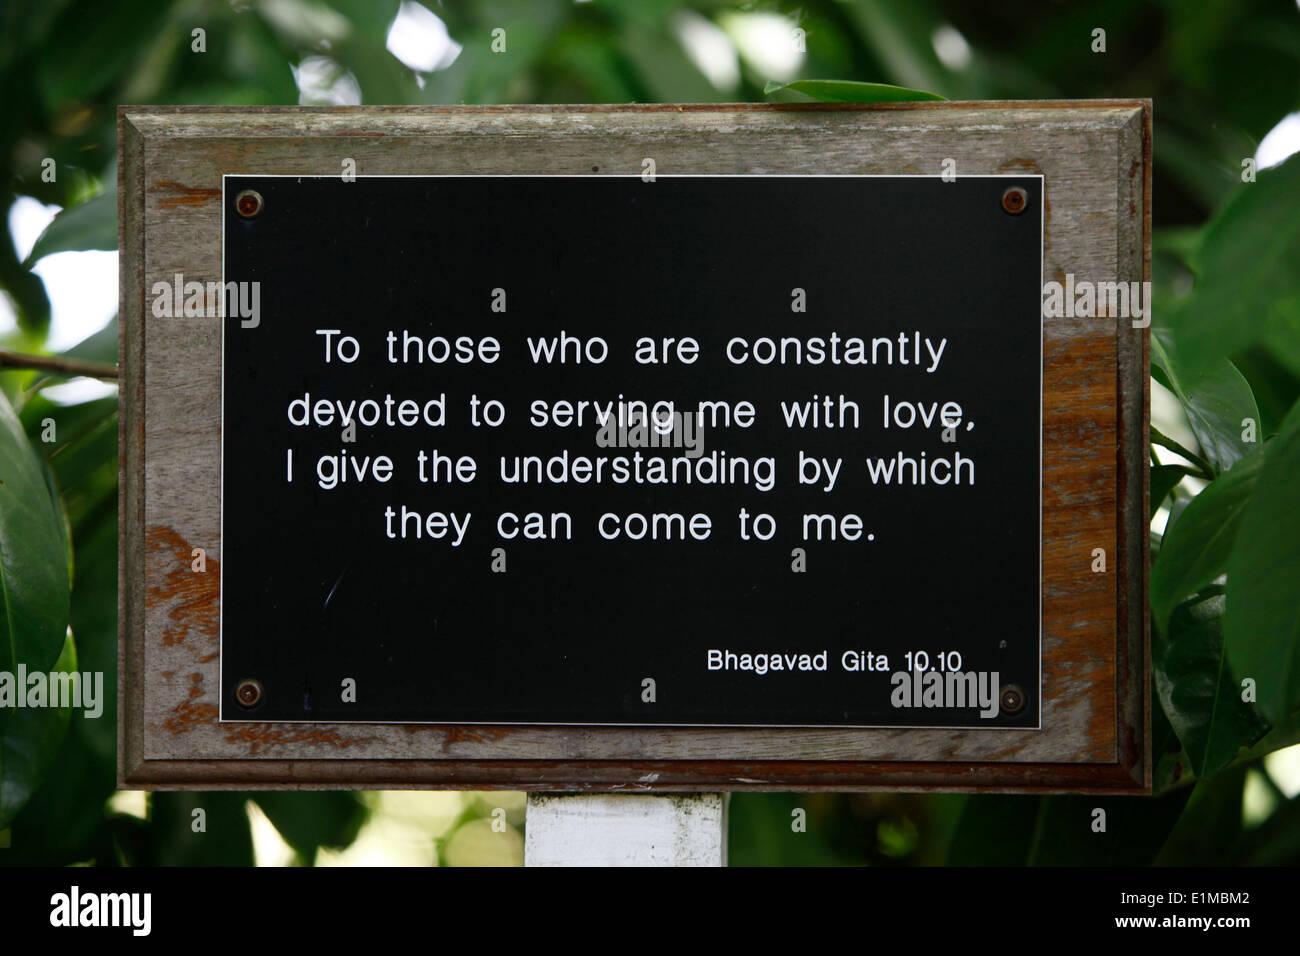 Bhaktivedanta Manor Quotation from the Bhagavad Gita - Stock Image